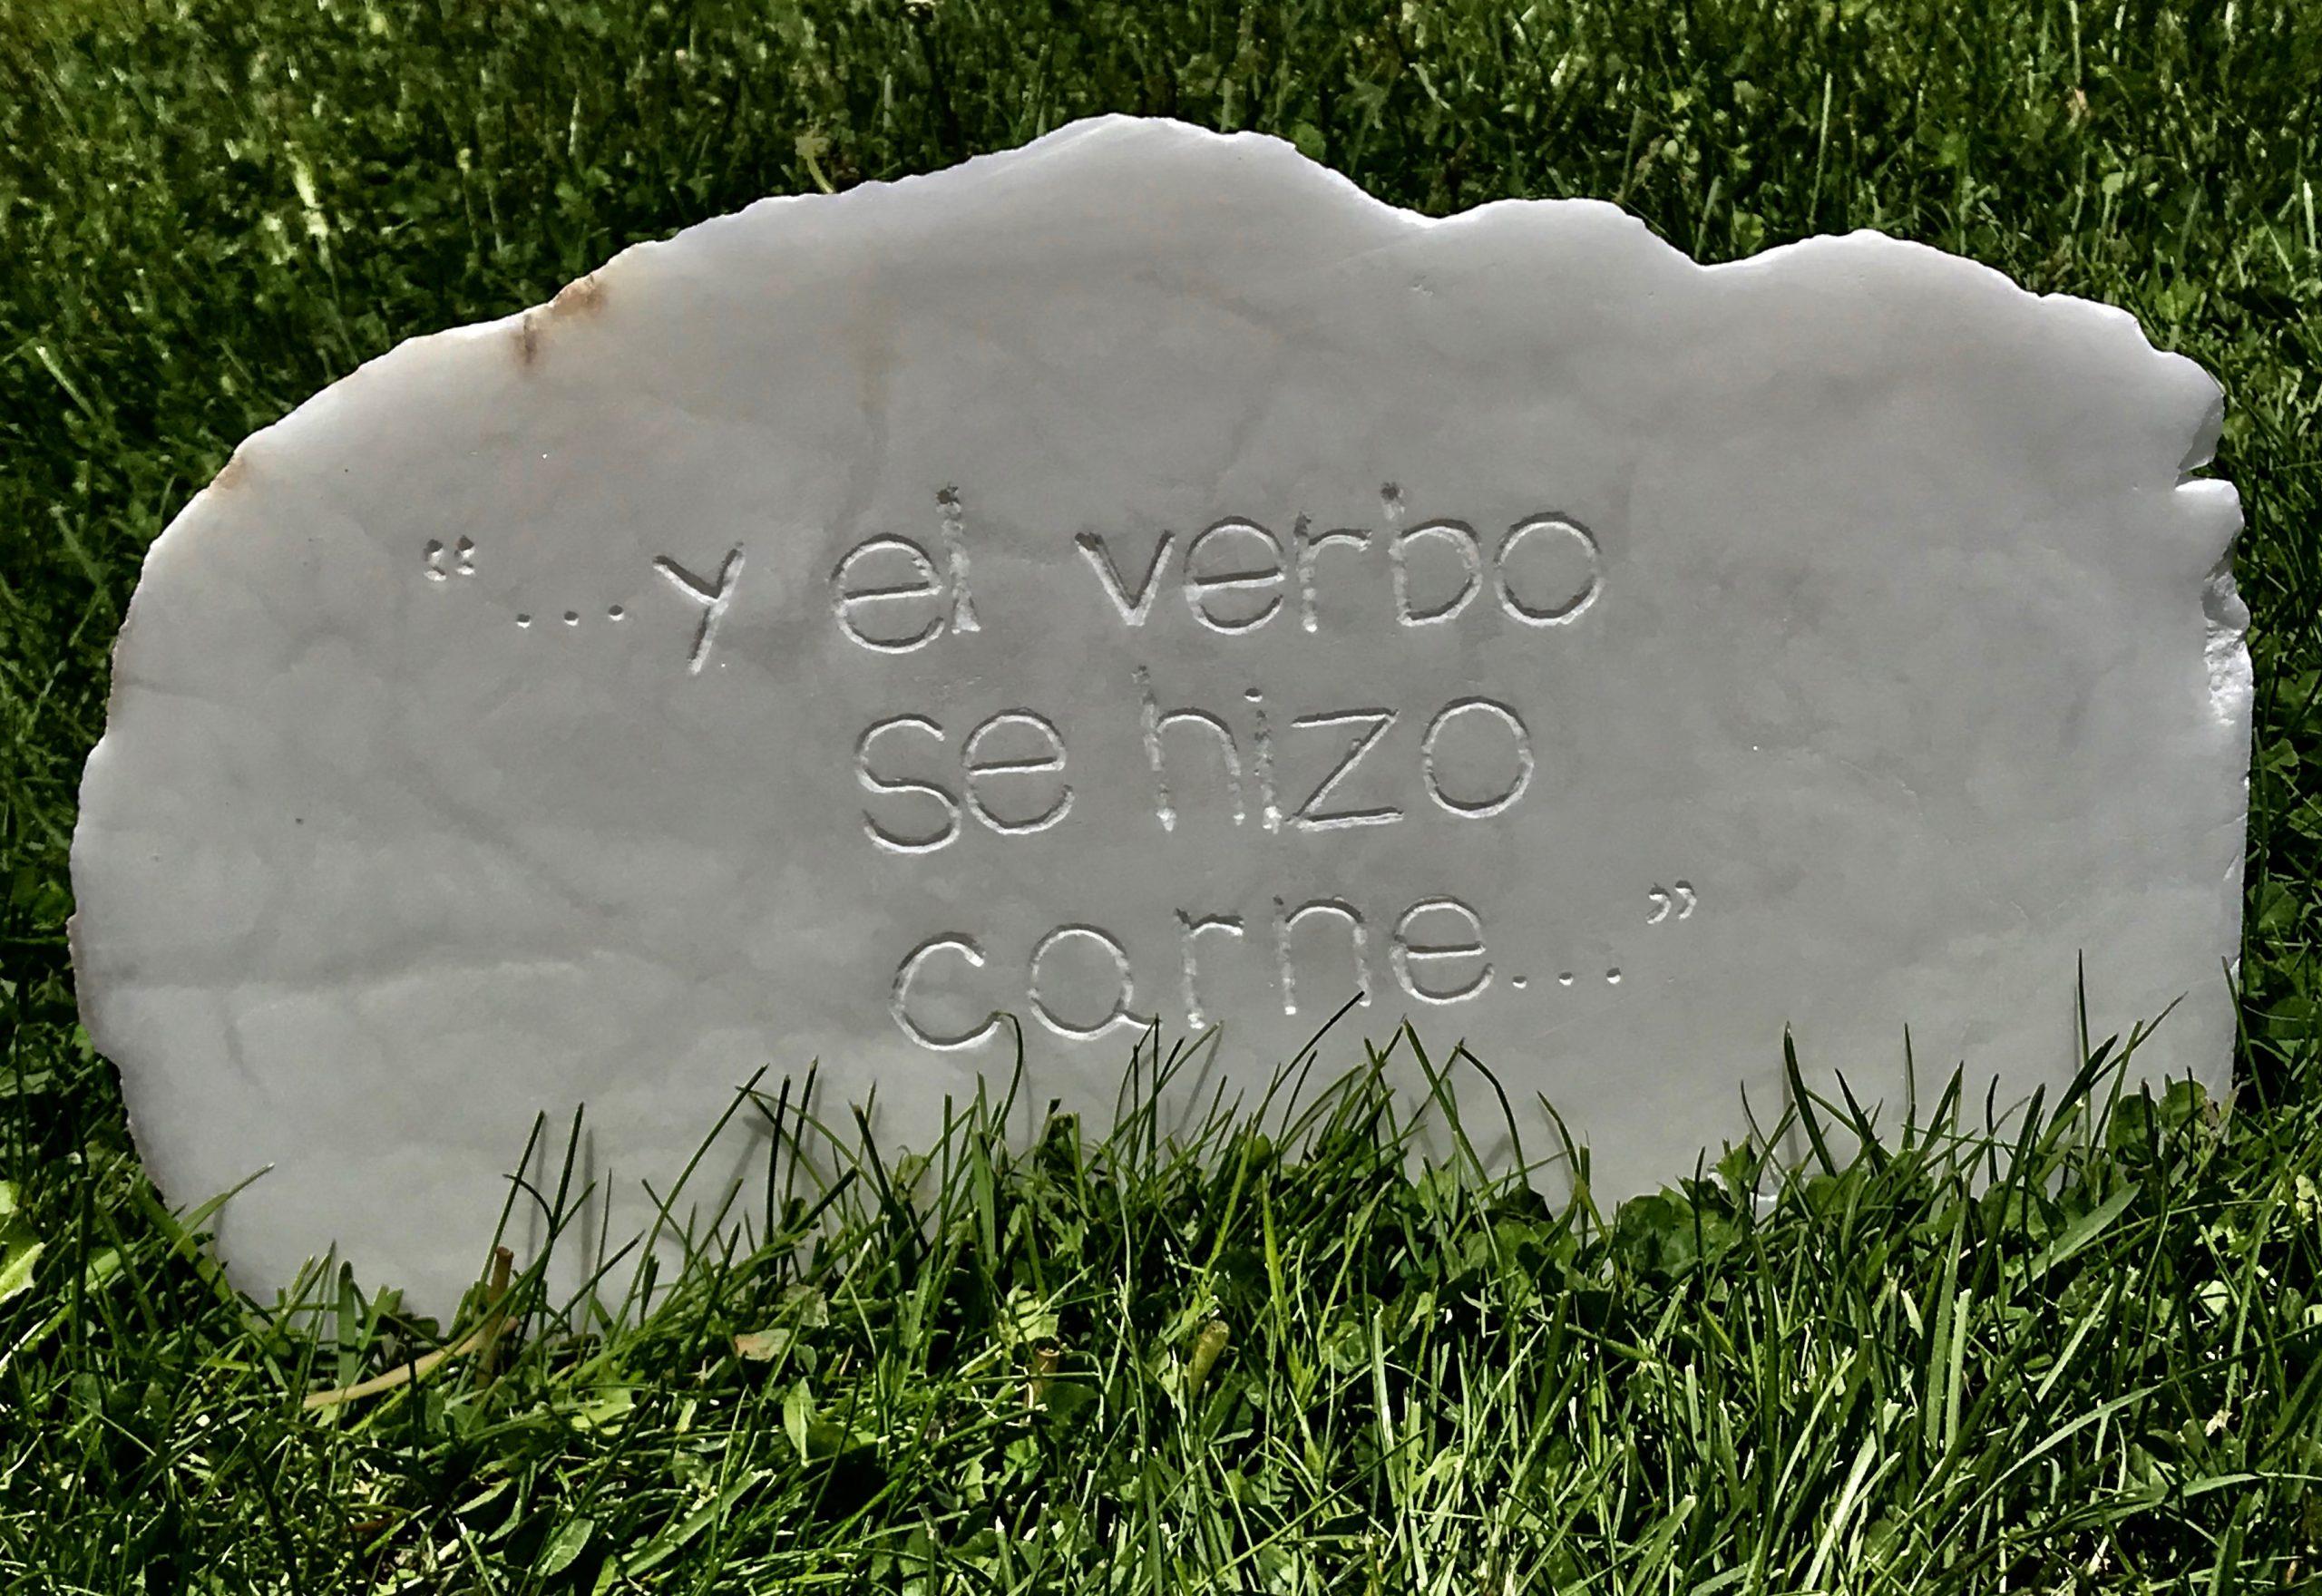 """…Y EL VERBO SE HIZO CARNE"" – ""…Y EL VERBO SE HIZO CARNE"""